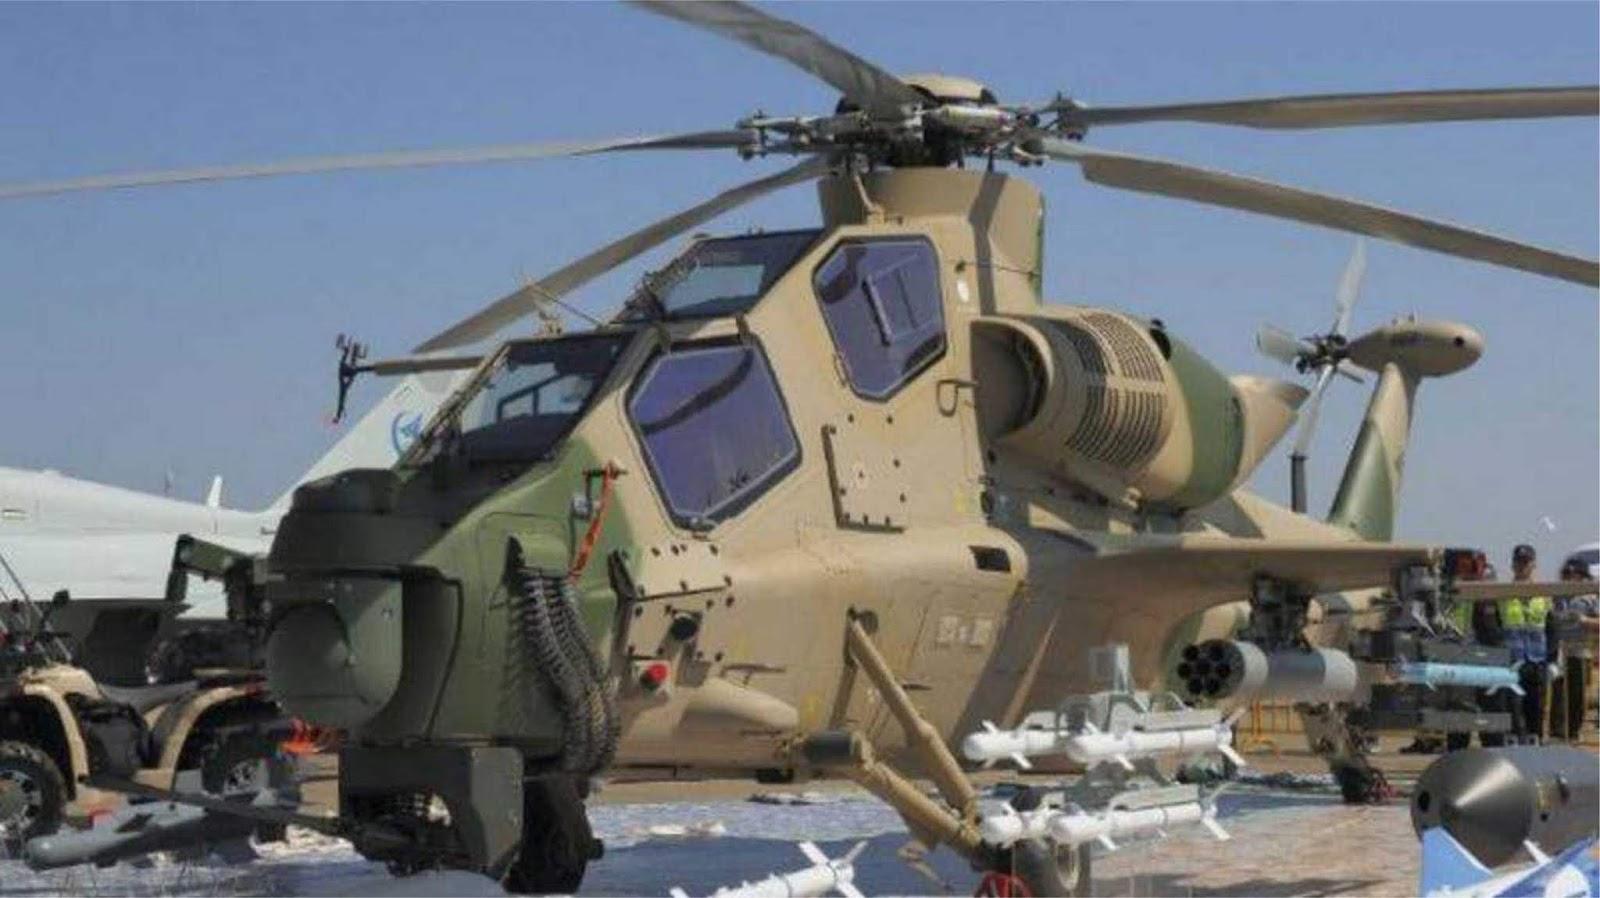 China memperkenalkan helikopter serang - Z-10ME versi ekspor